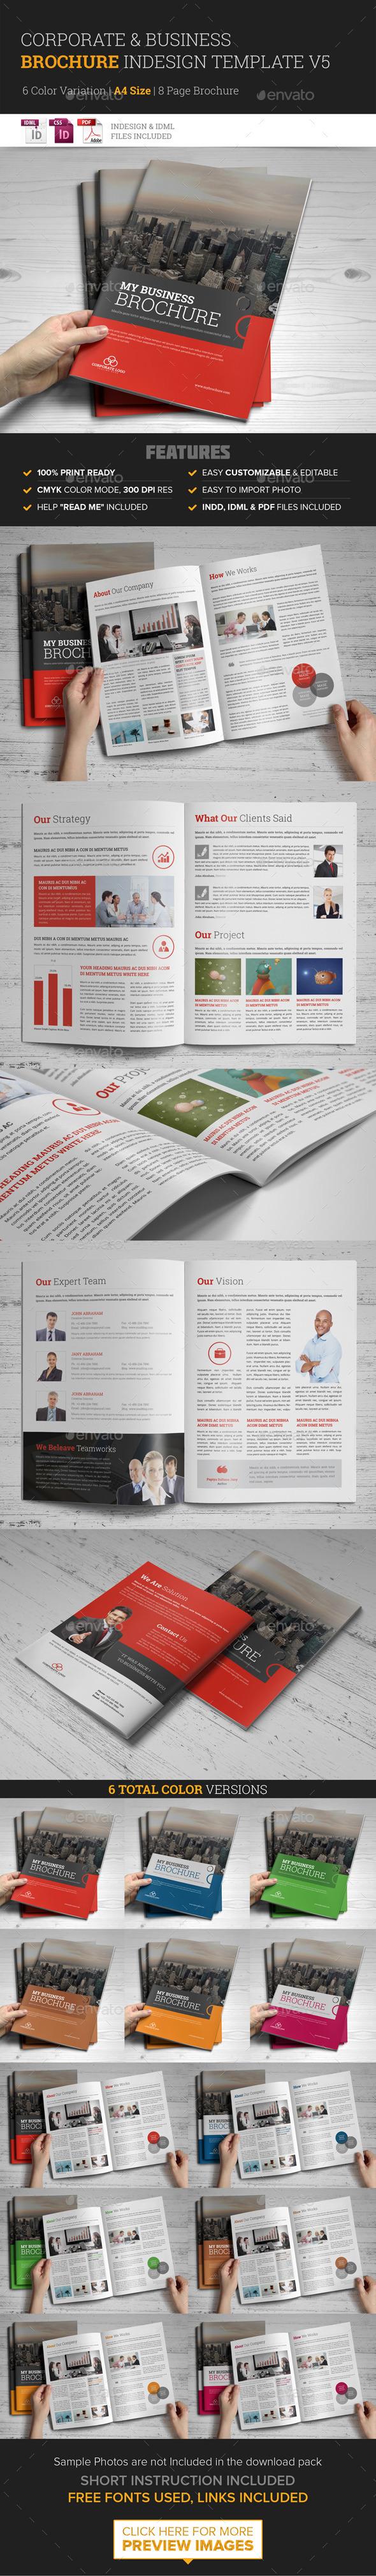 Corporate Multipurpose Brochure Template v5 - Corporate Brochures